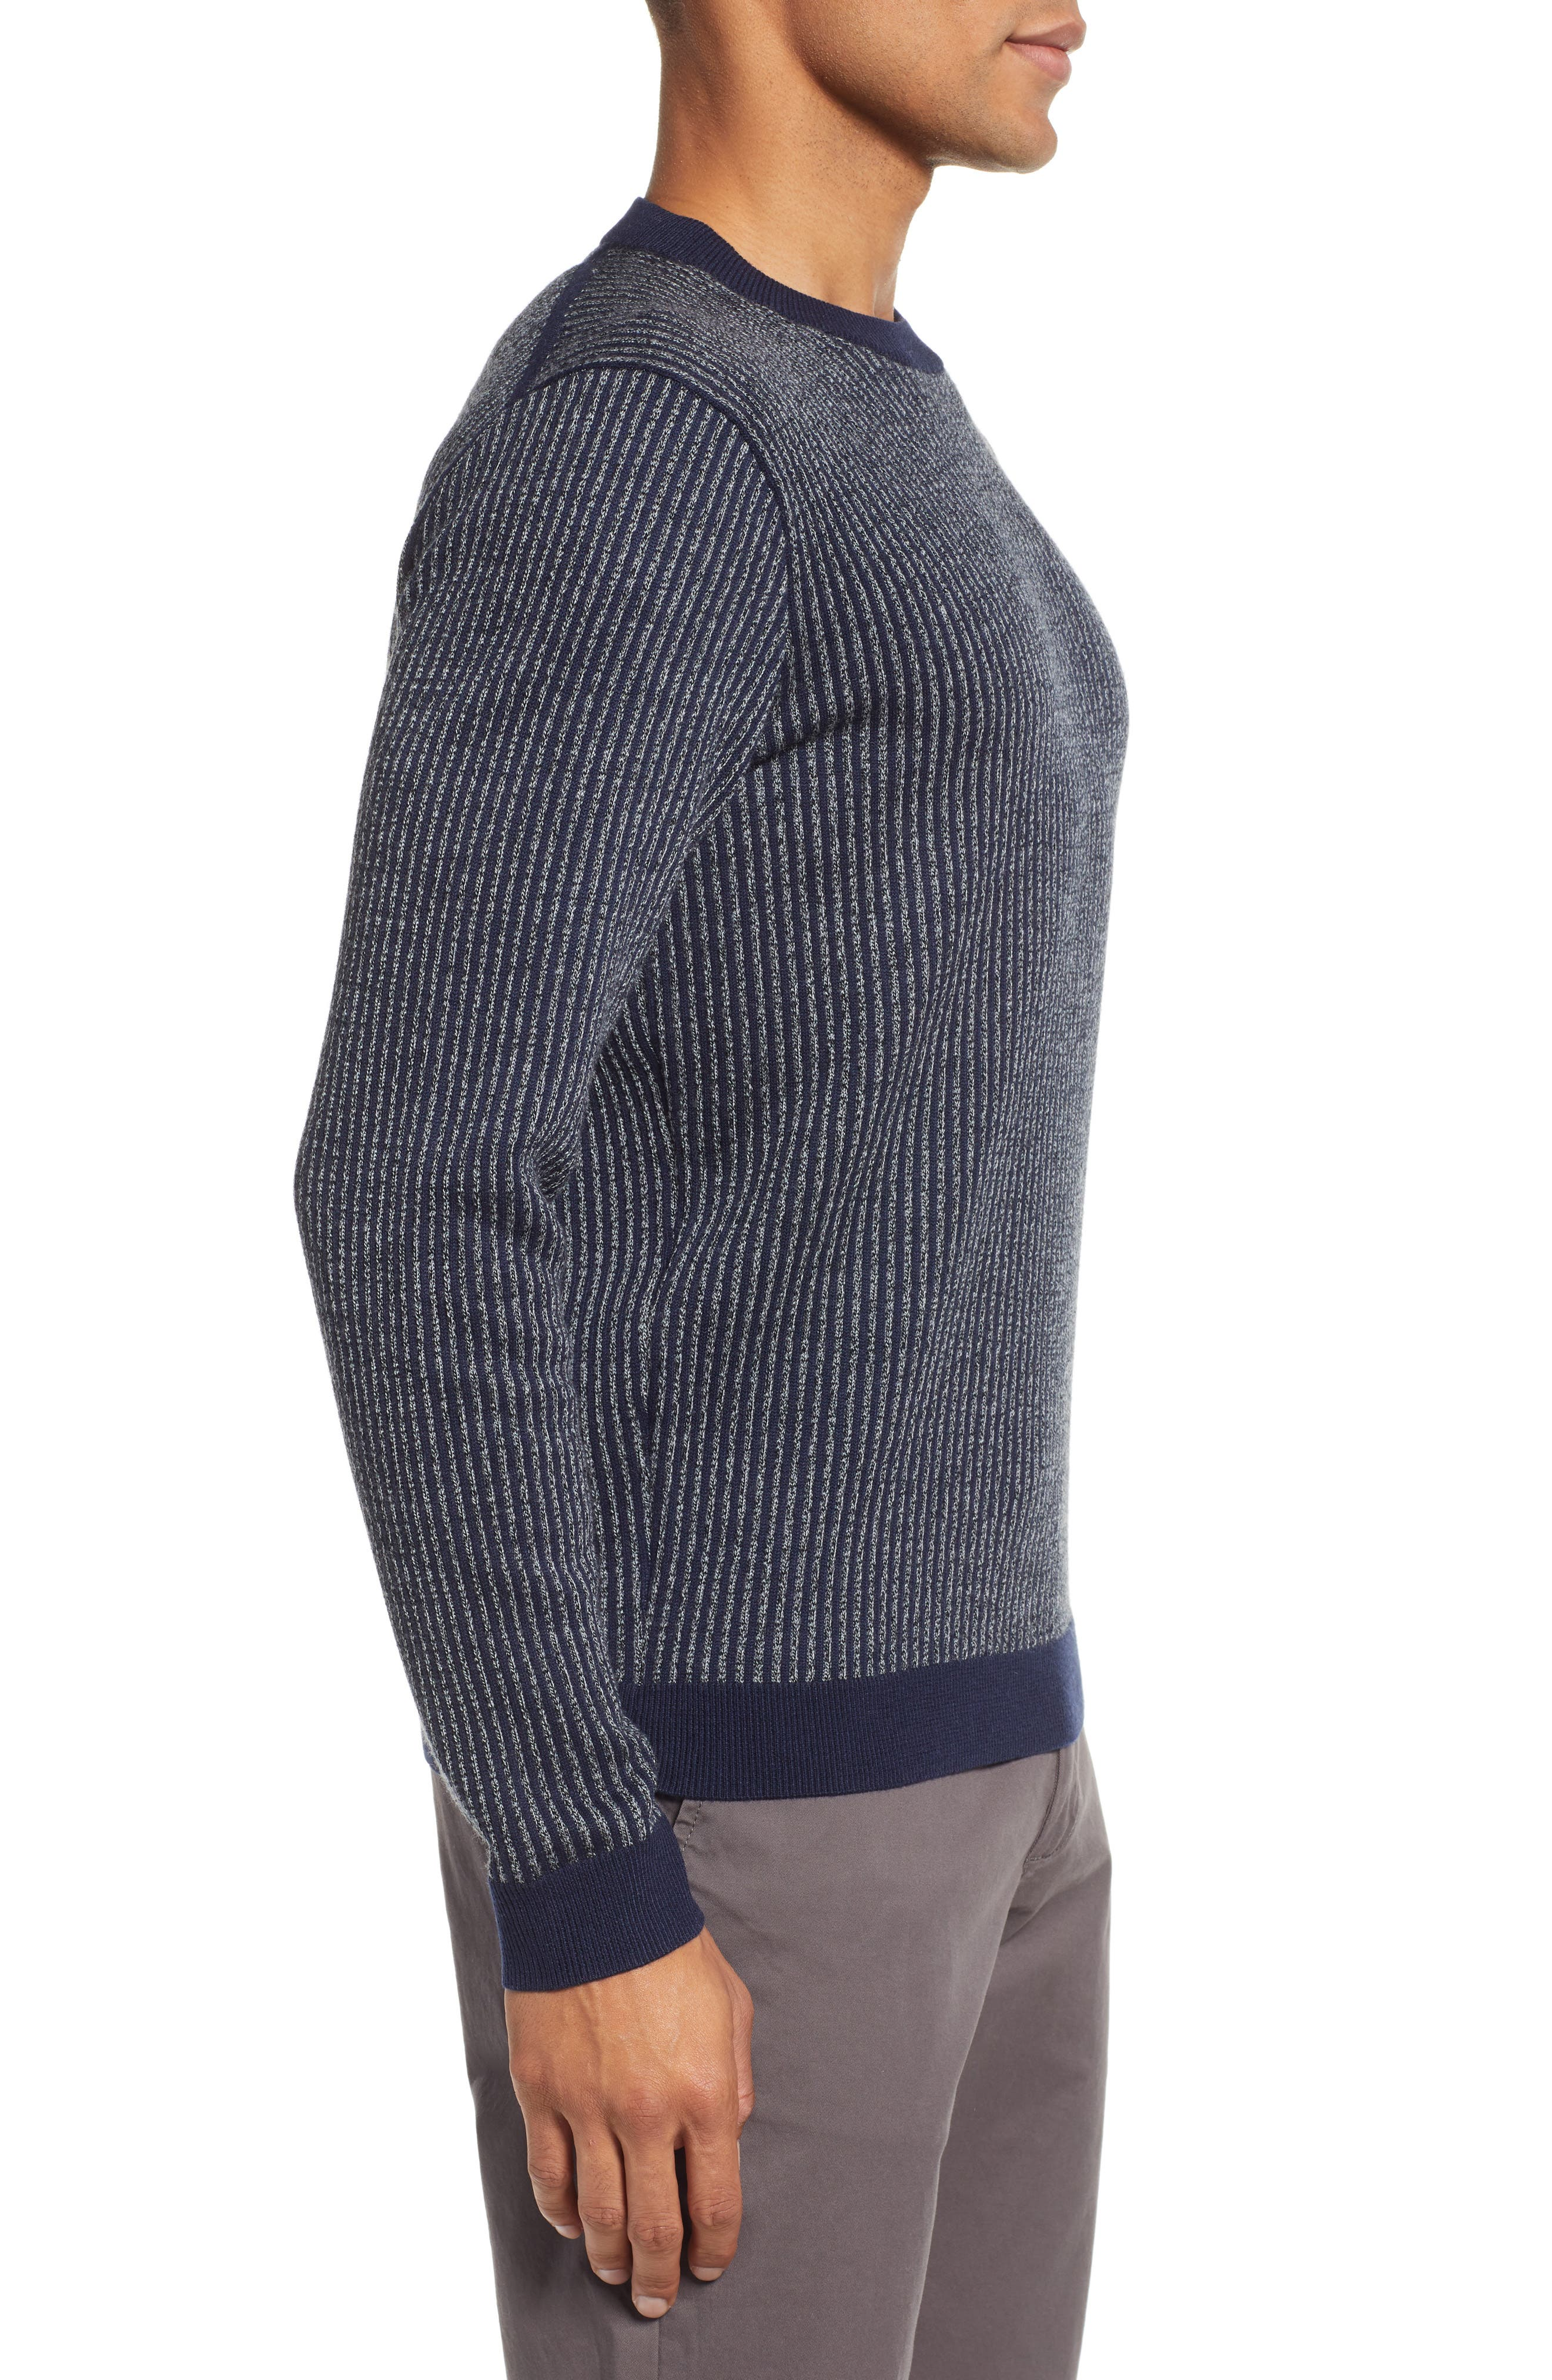 Jinxitt Crewneck Sweater,                             Alternate thumbnail 3, color,                             NAVY